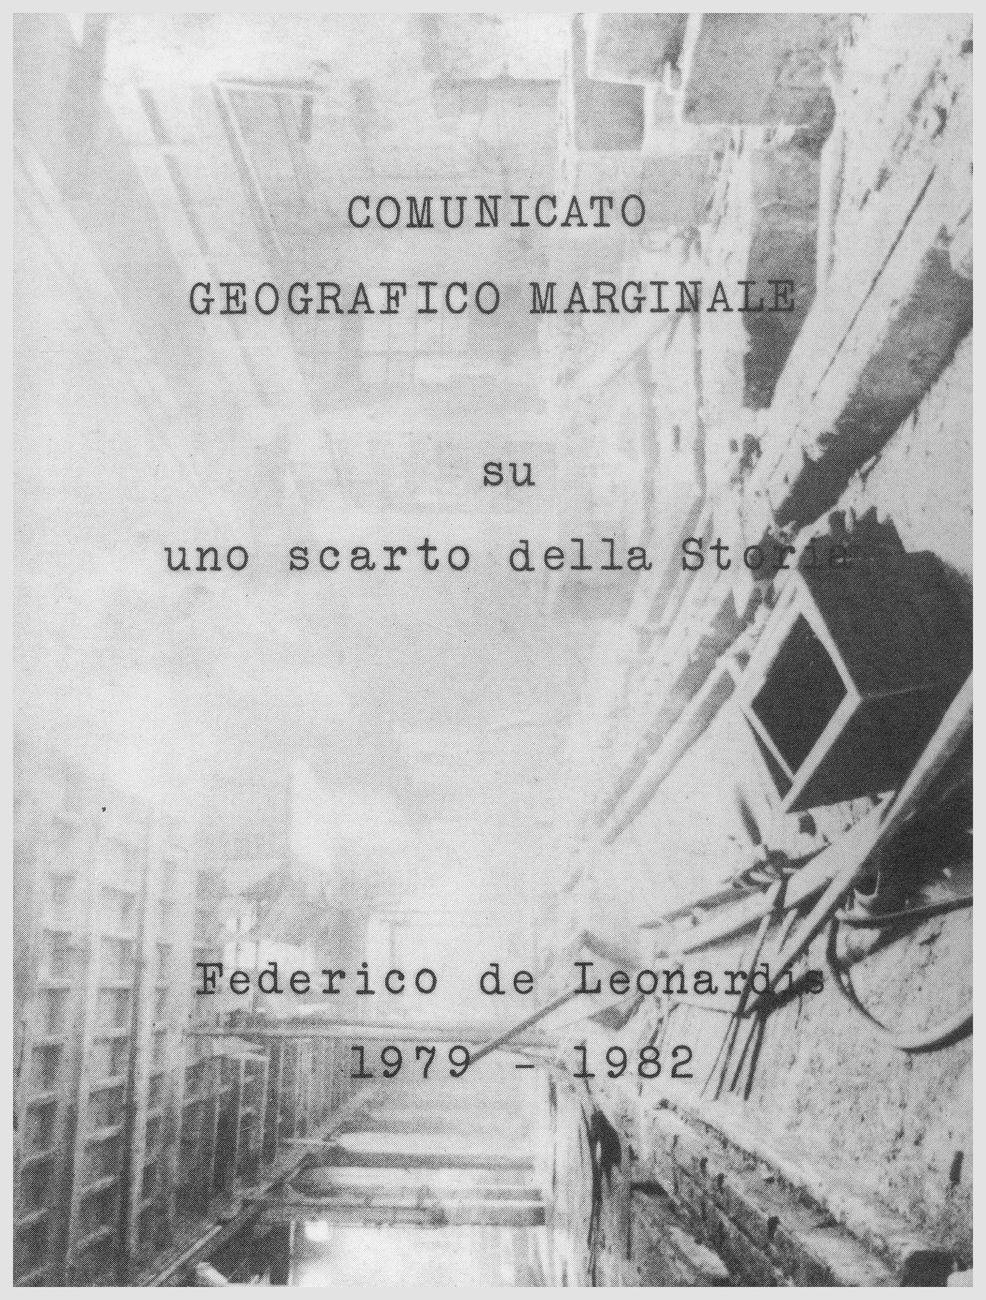 Federico De Leonardis, Comunicato Geografico Marginale, 1979-81, frontespizio